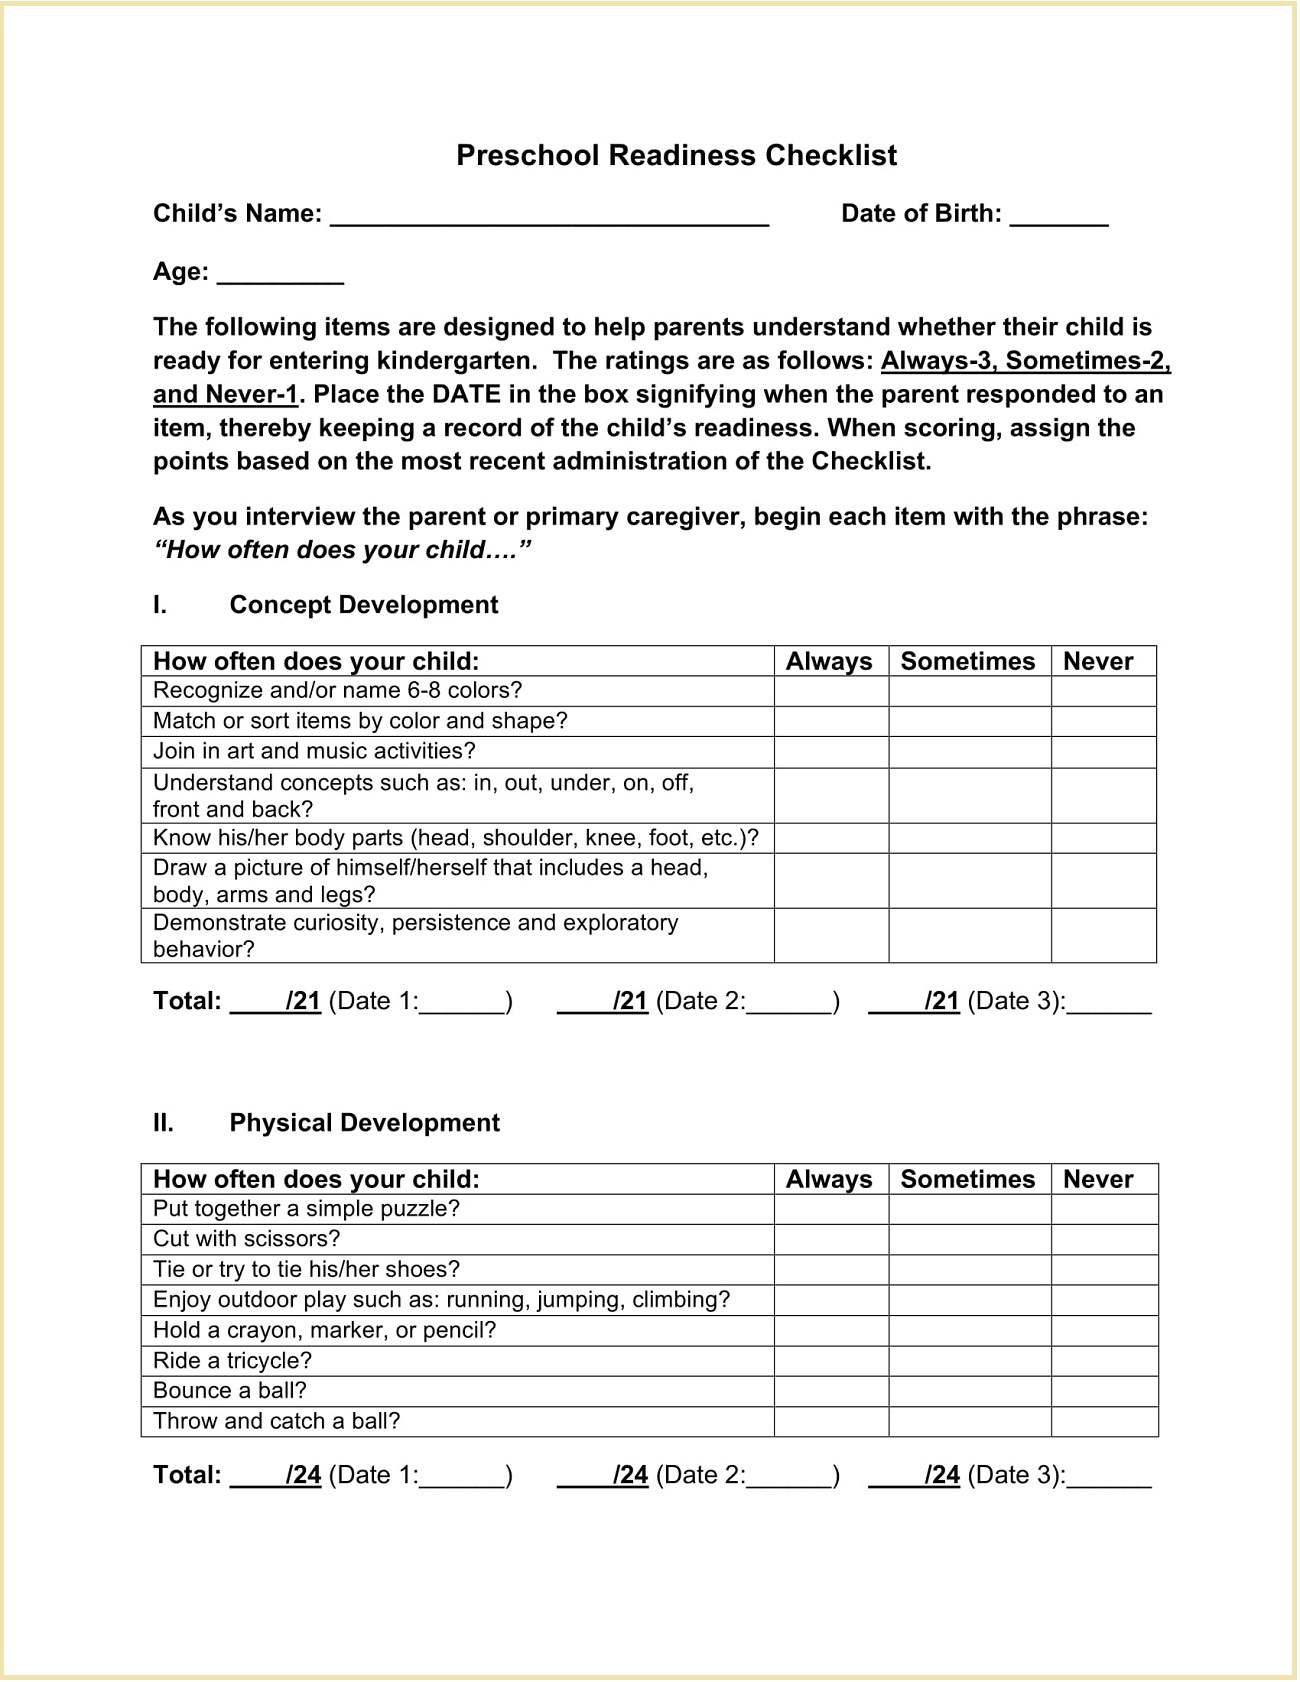 Kindergarten Preschool Readiness Checklist Template PDF